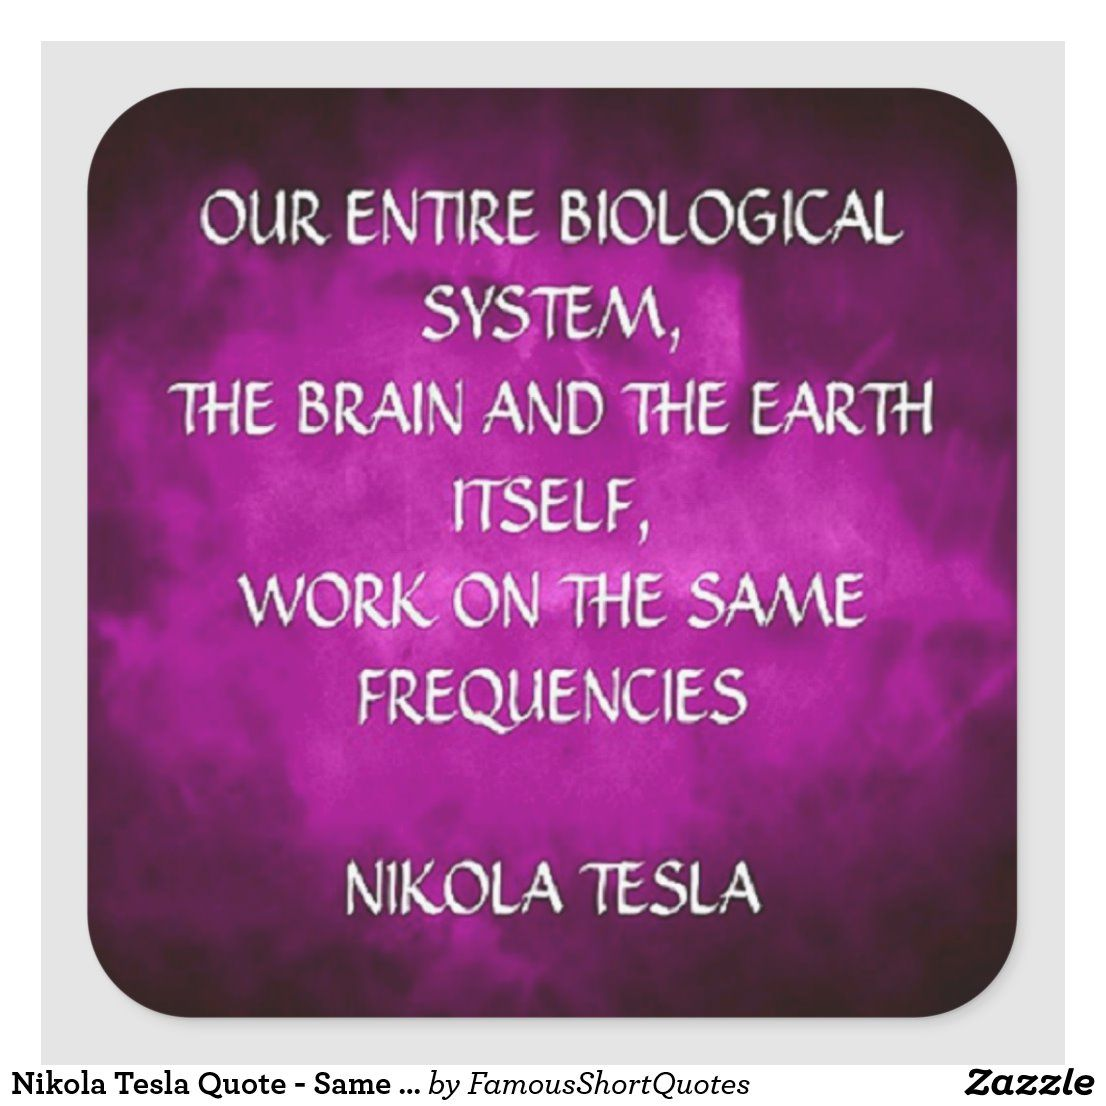 Nikola Tesla Quote Same Frequencies Square Sticker